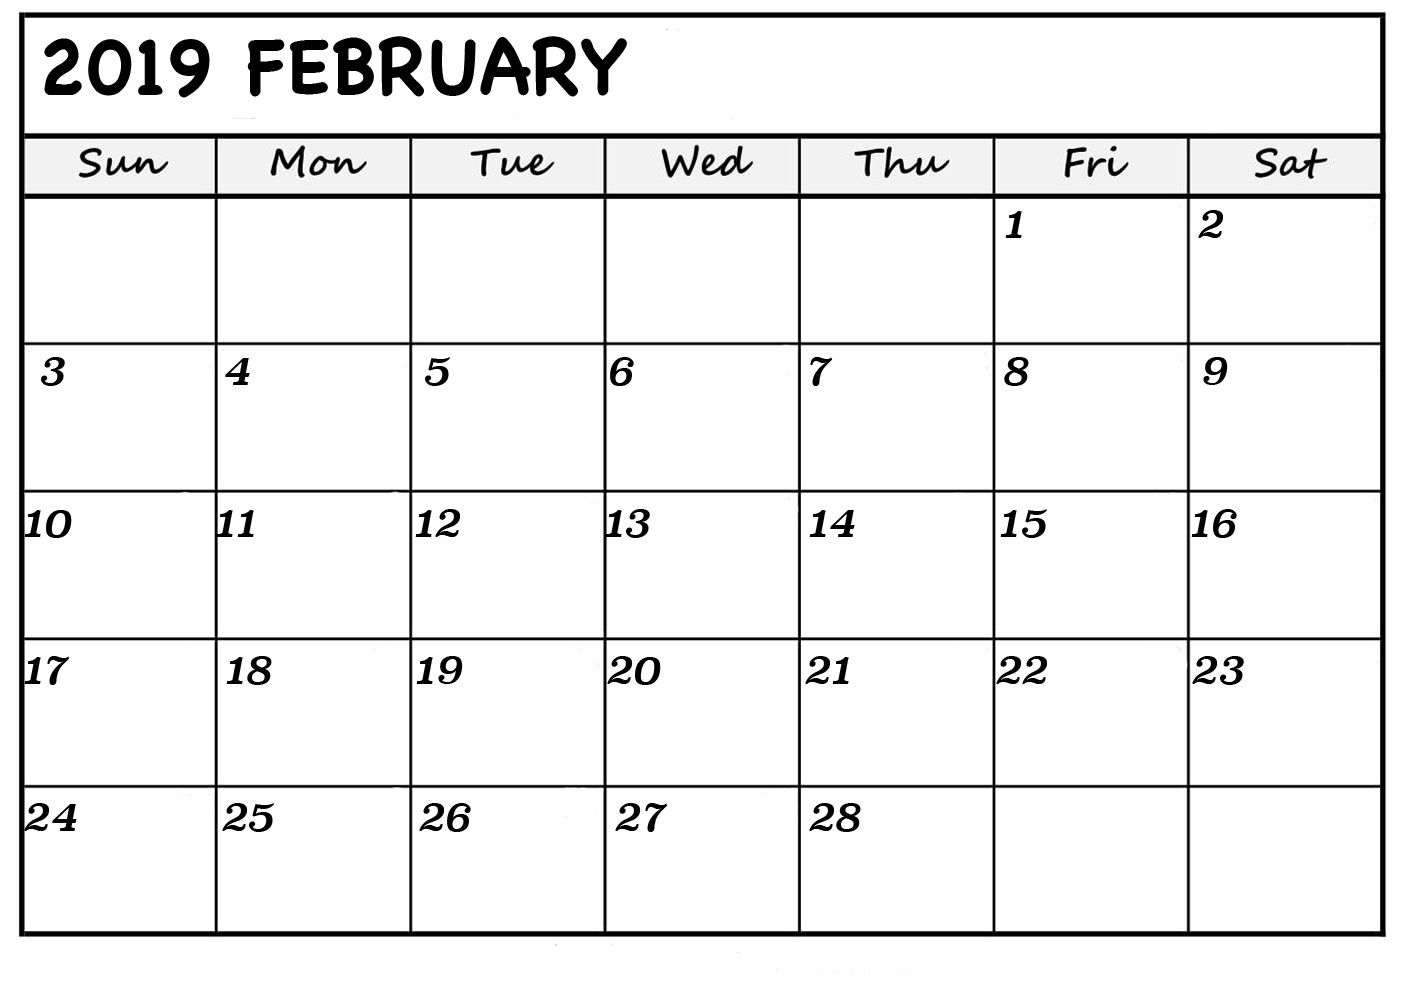 February Blank Calendar 2019 | Monthly Calendar Template in Fill In Calendar 2019 Pdf